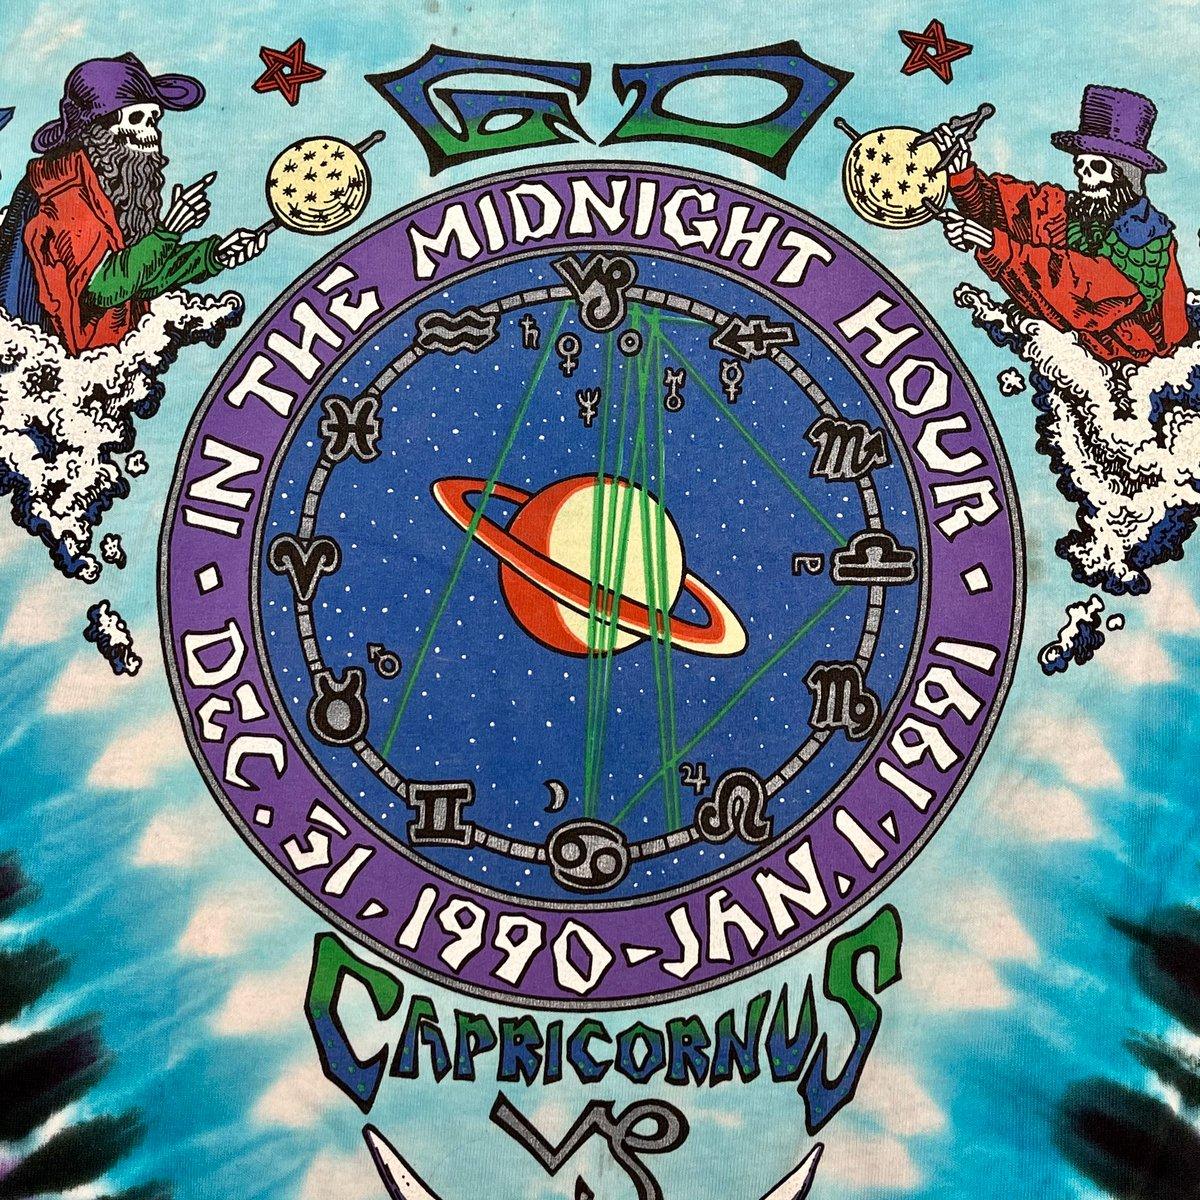 Original Vintage Grateful Dead New Years Eve 1990! Short Sleeve Dye!! - Large